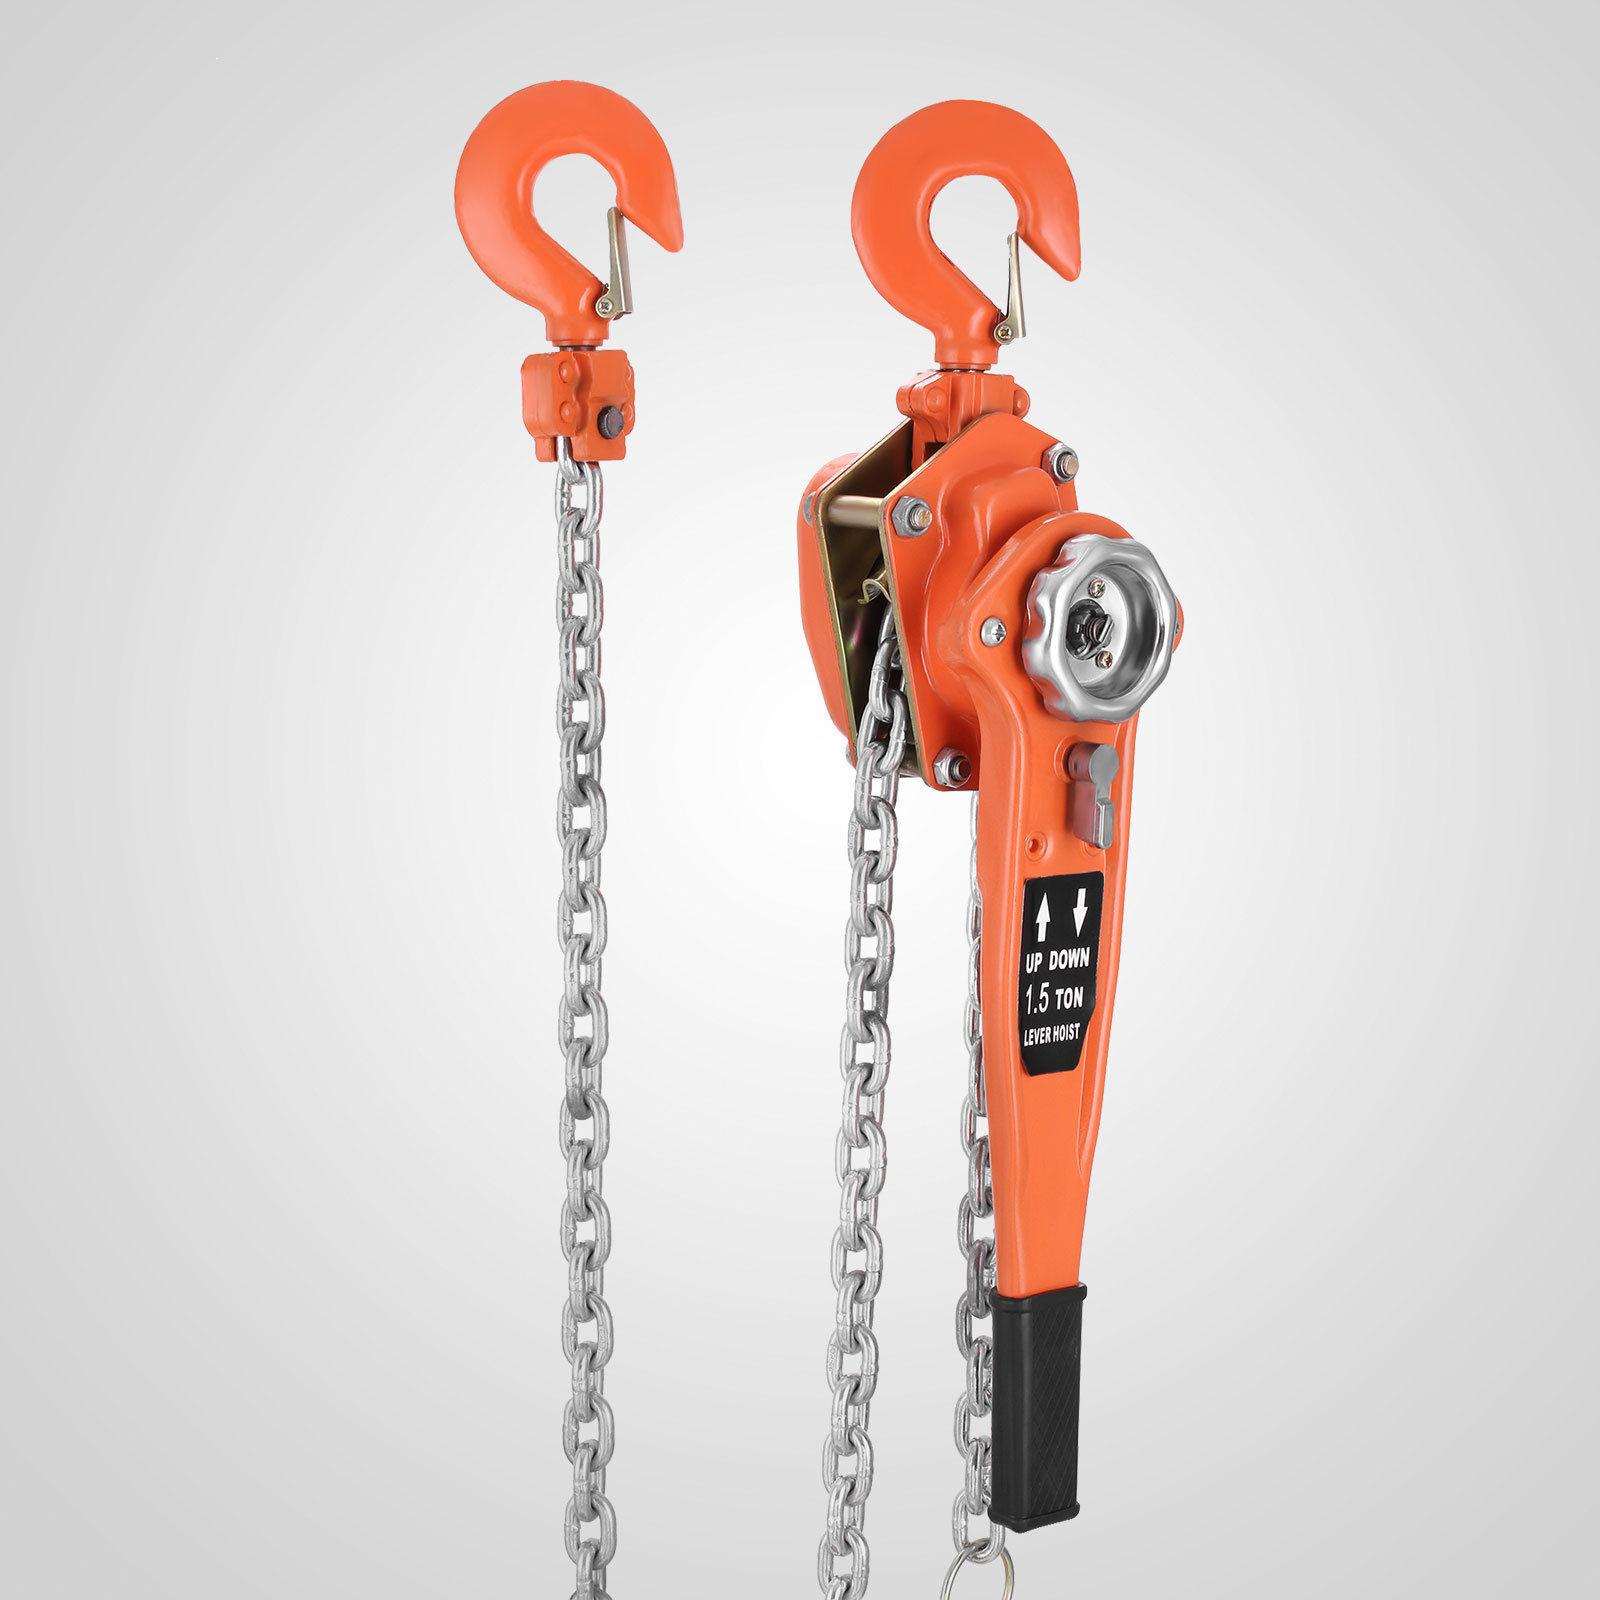 New 3000 Lbs Heavy Duty Come Along Chain Ratchet Hoist